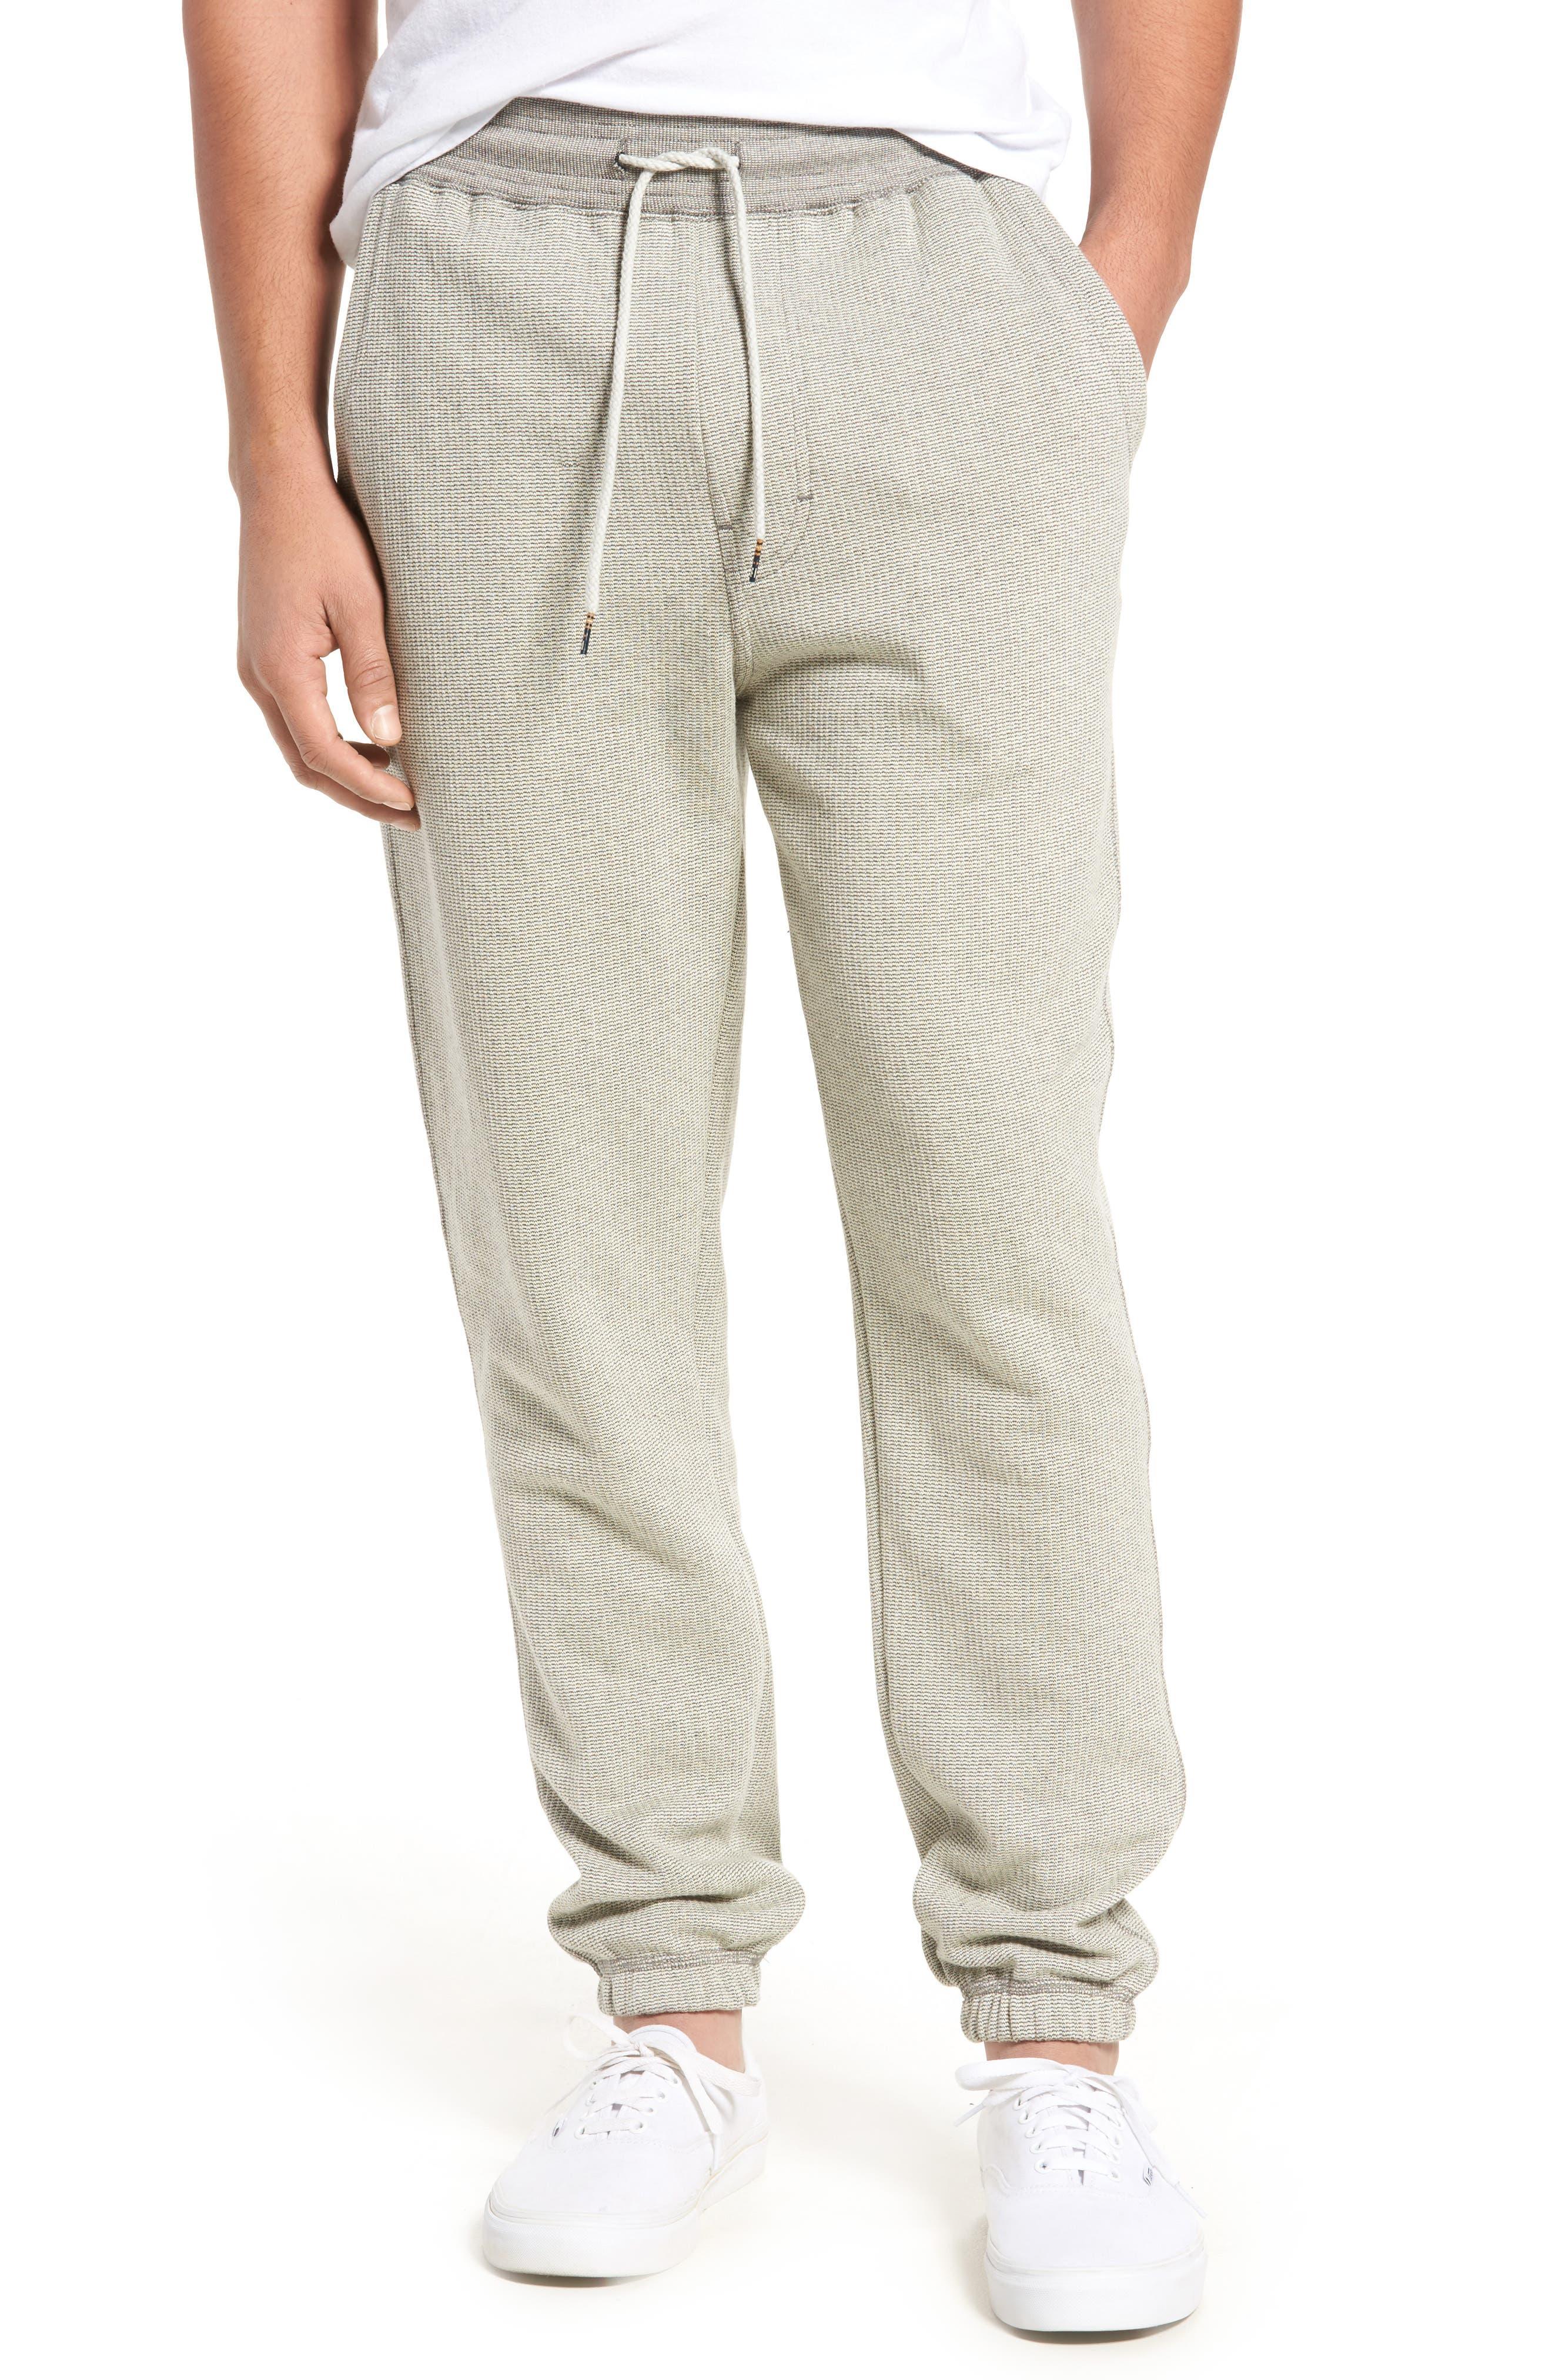 Hudson Sweatpants,                         Main,                         color, Oatmeal